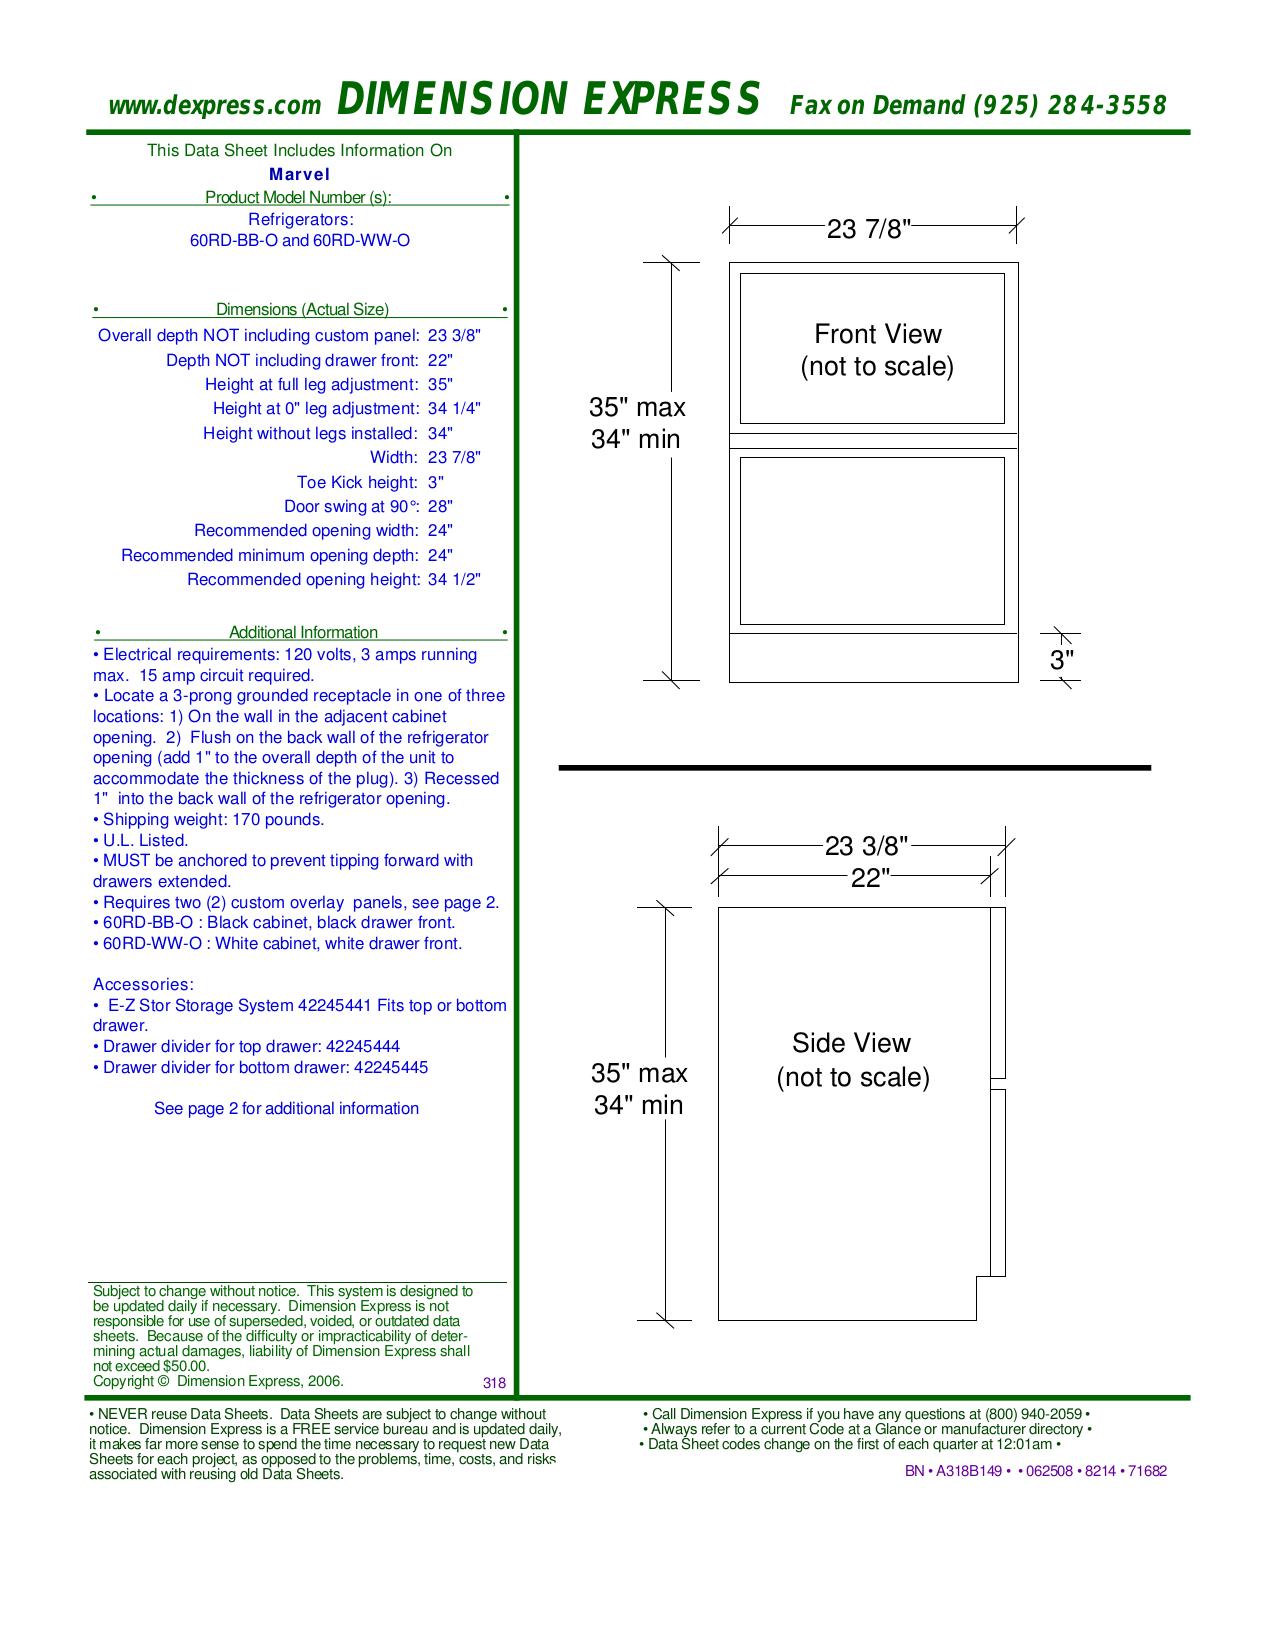 pdf for Marvel Refrigerator 60RD-BB-F manual